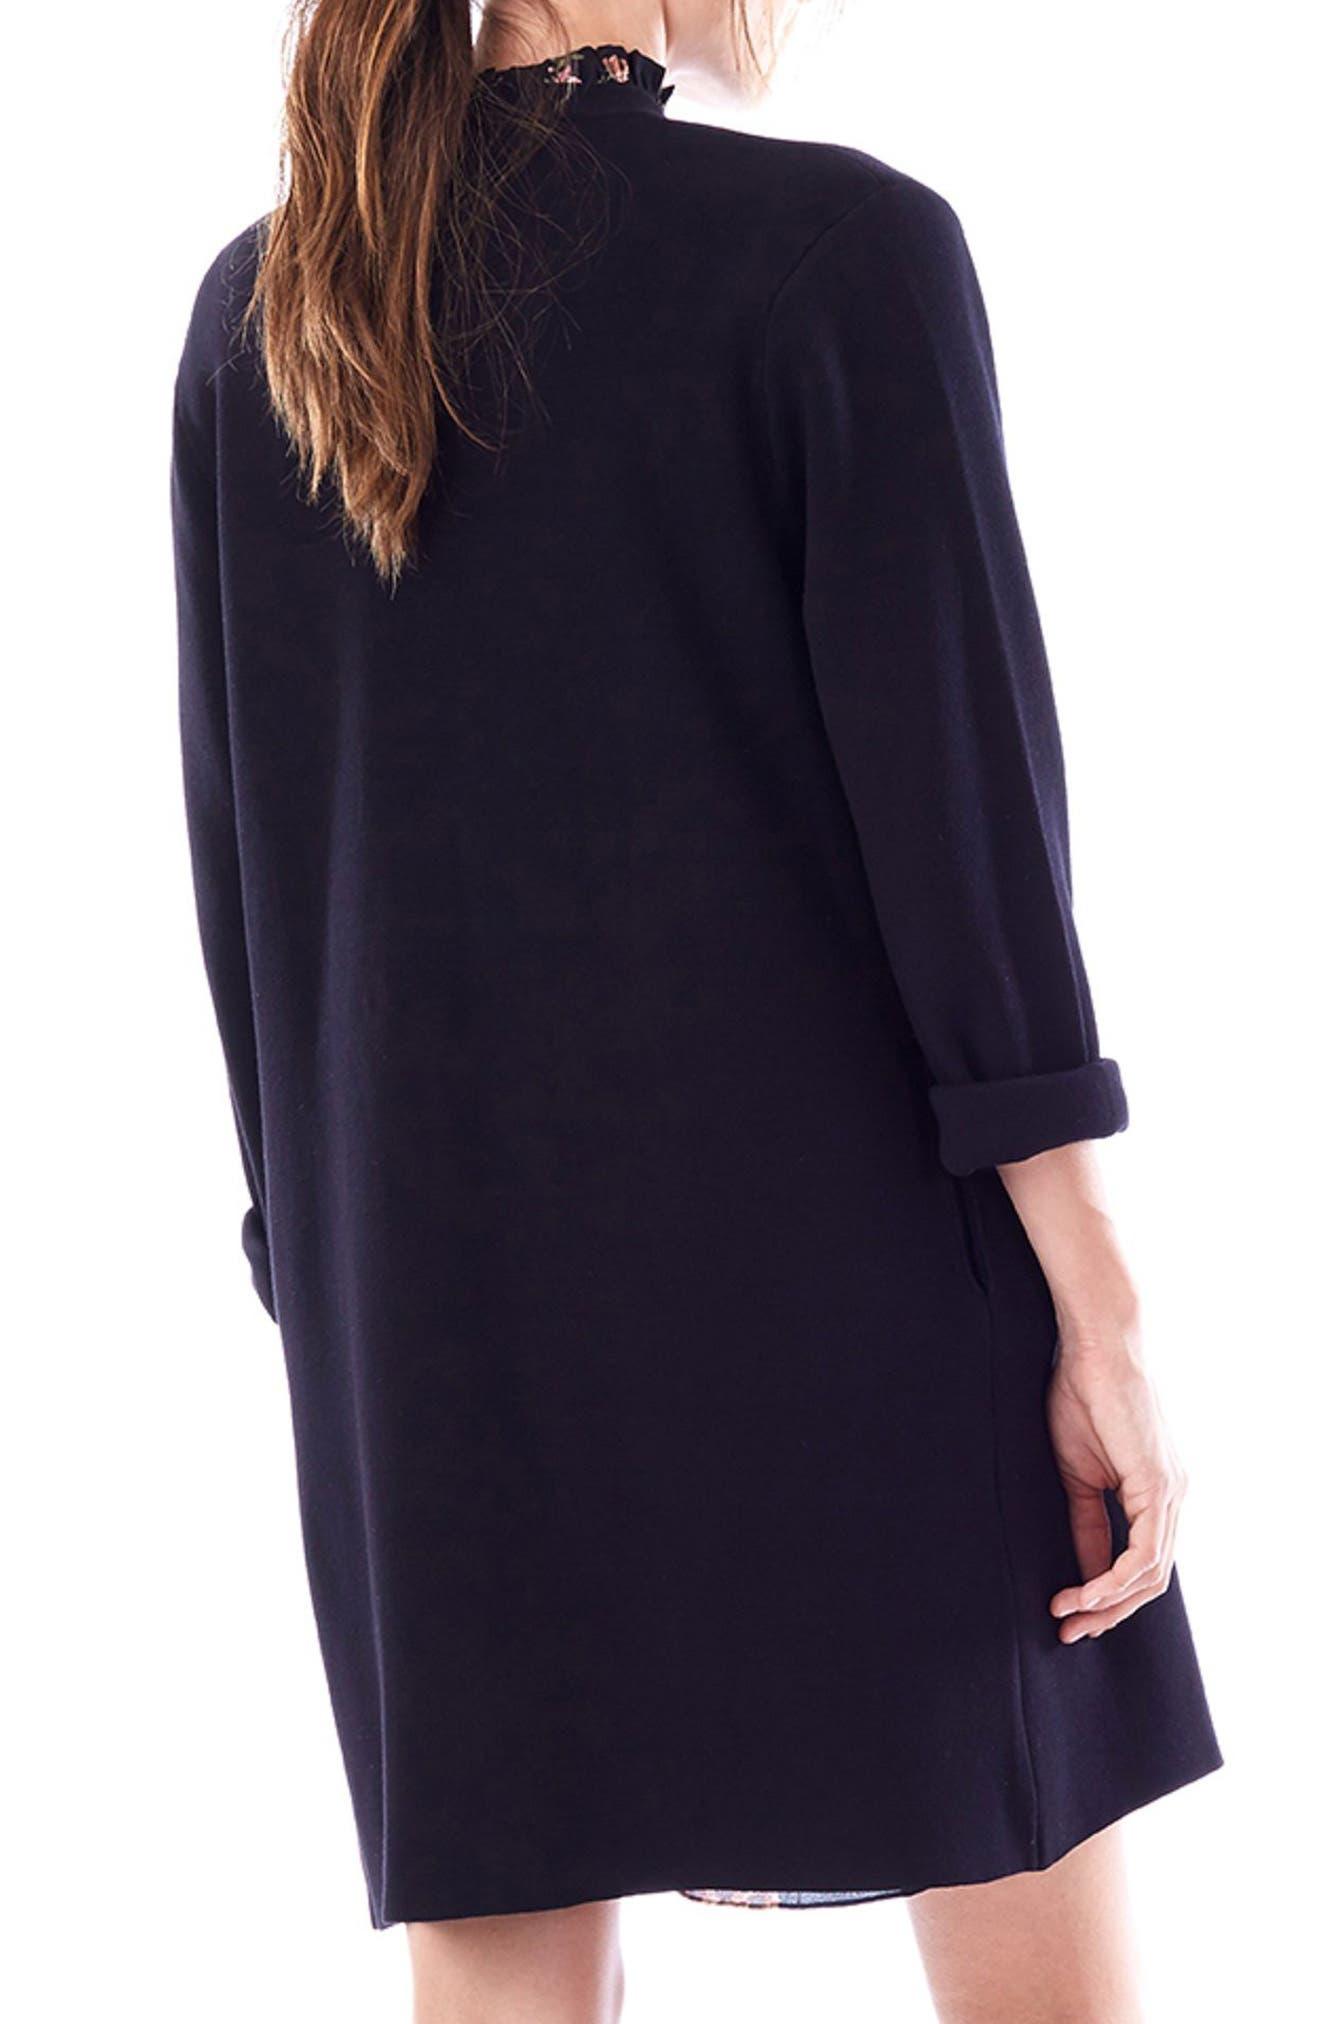 Olivia Maternity Sweater Jacket,                             Alternate thumbnail 2, color,                             BLACK